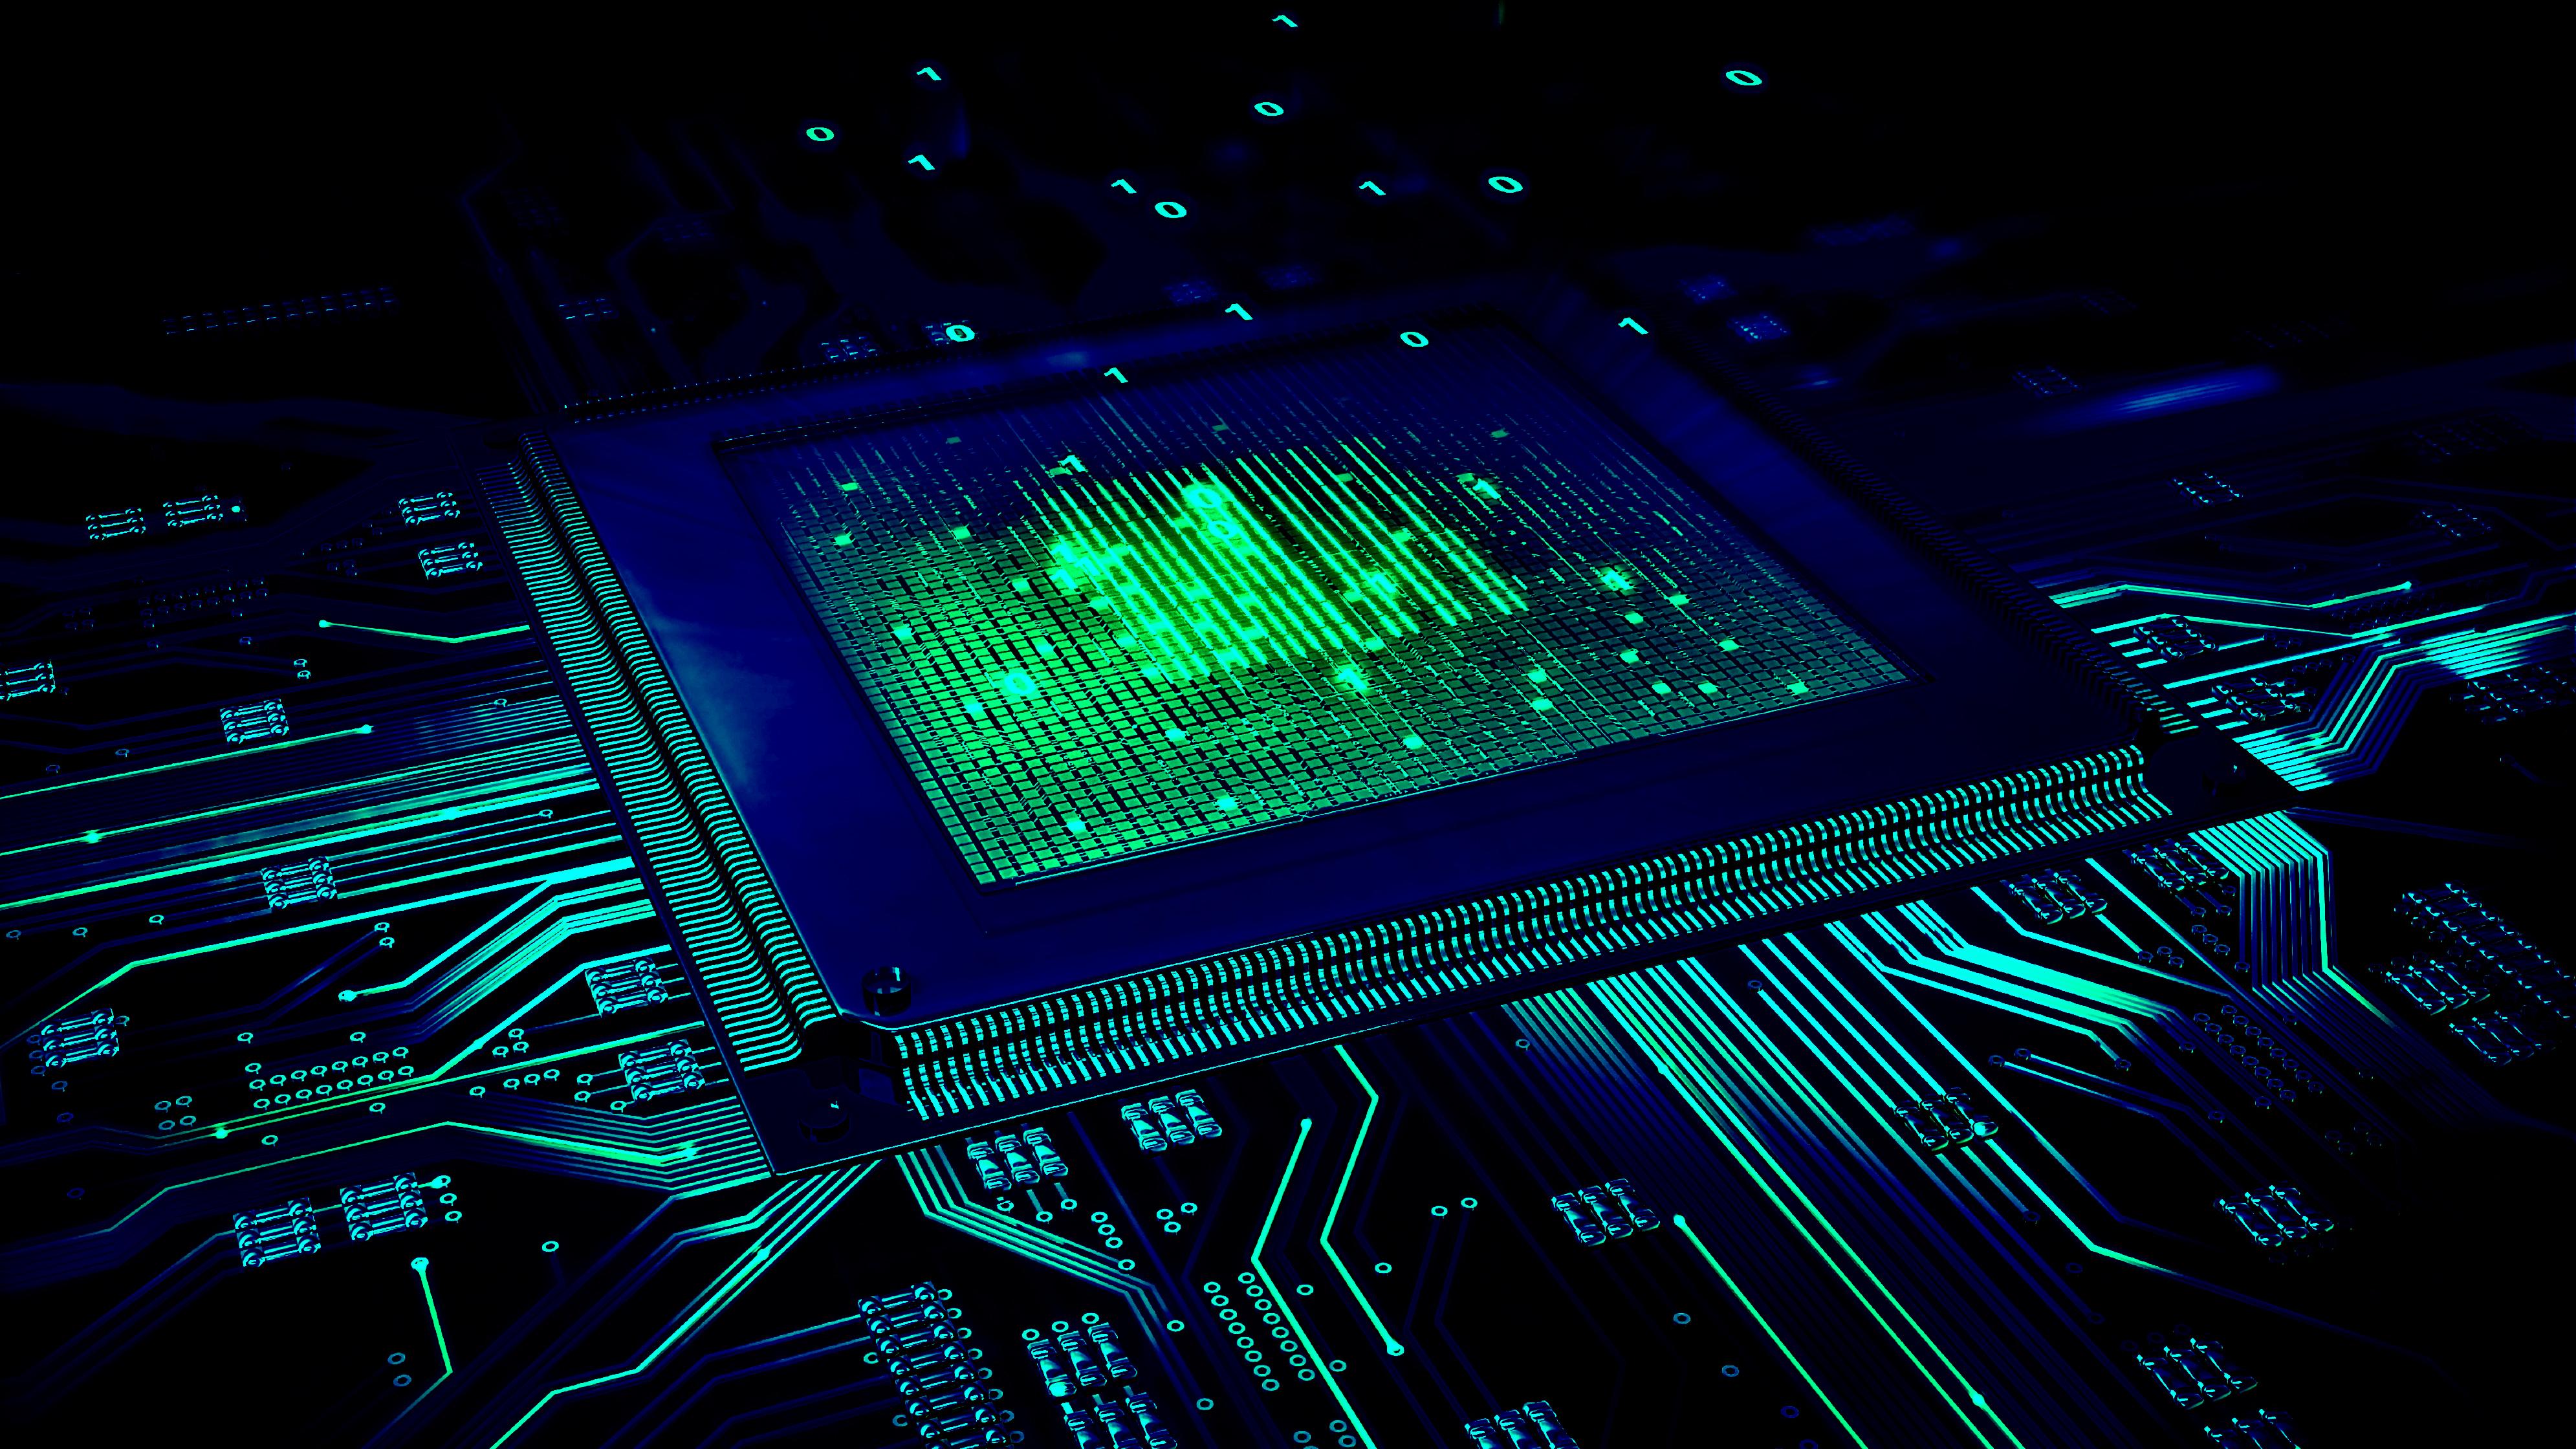 General 3982x2240 CPU tech circuit circuit boards computer technology